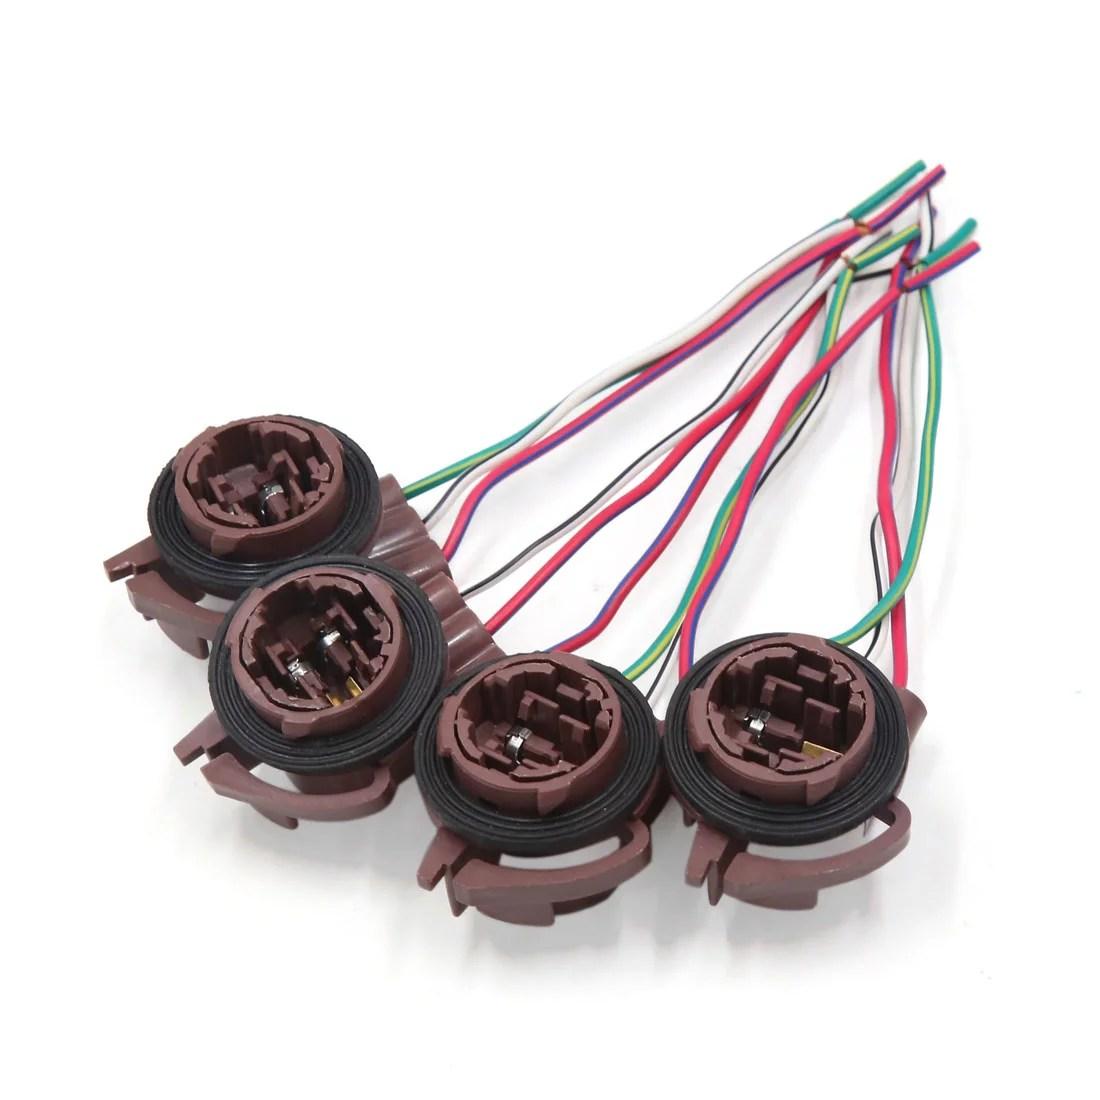 medium resolution of 4pcs 3157 4157 brake light lamp bulb wiring harness socket connector for car walmart canada